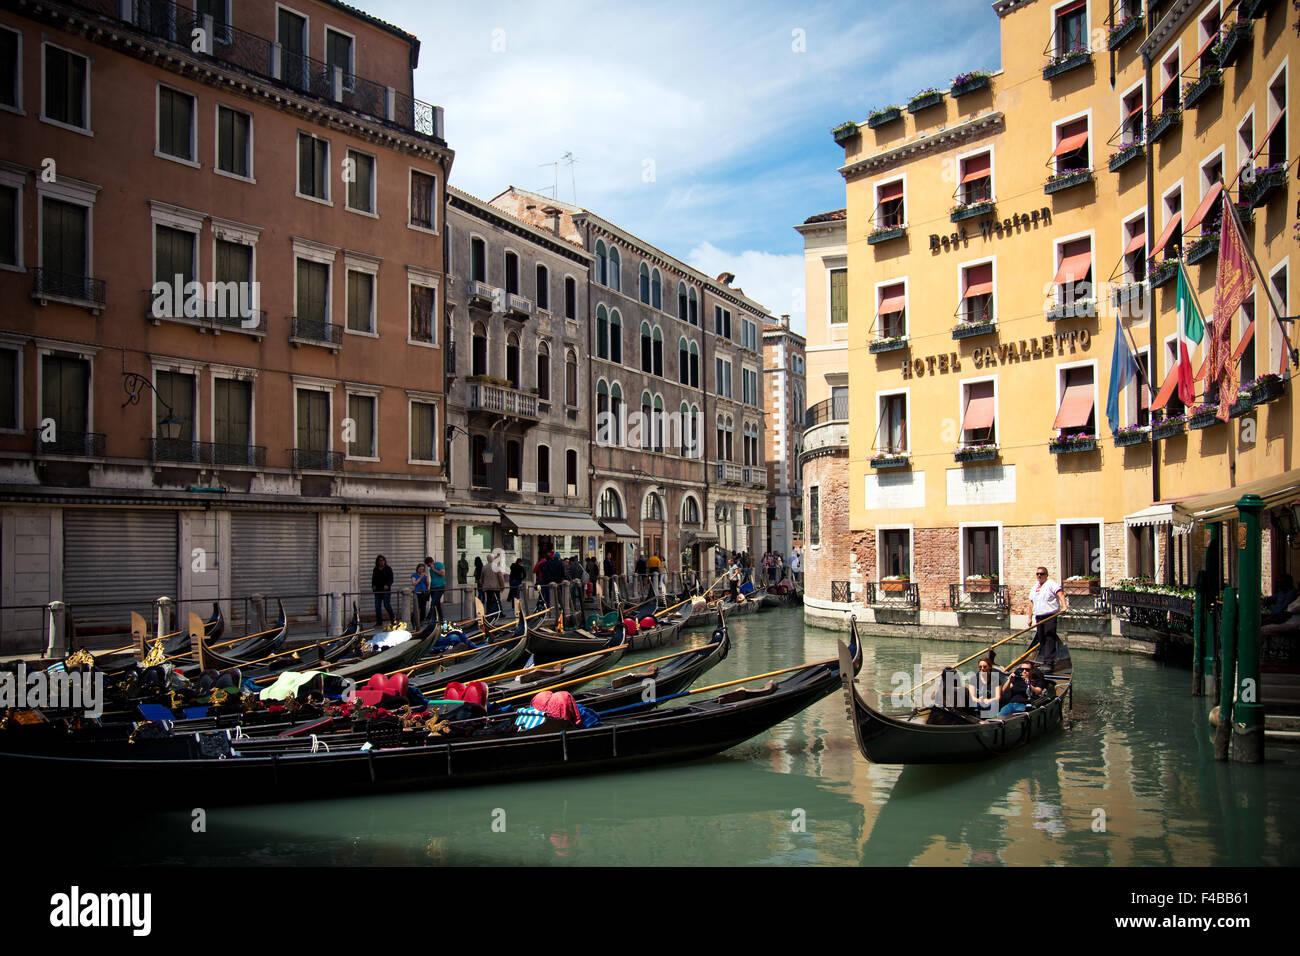 Gondola station Bacino Oresolo on canals in Venice Italy - Stock Image